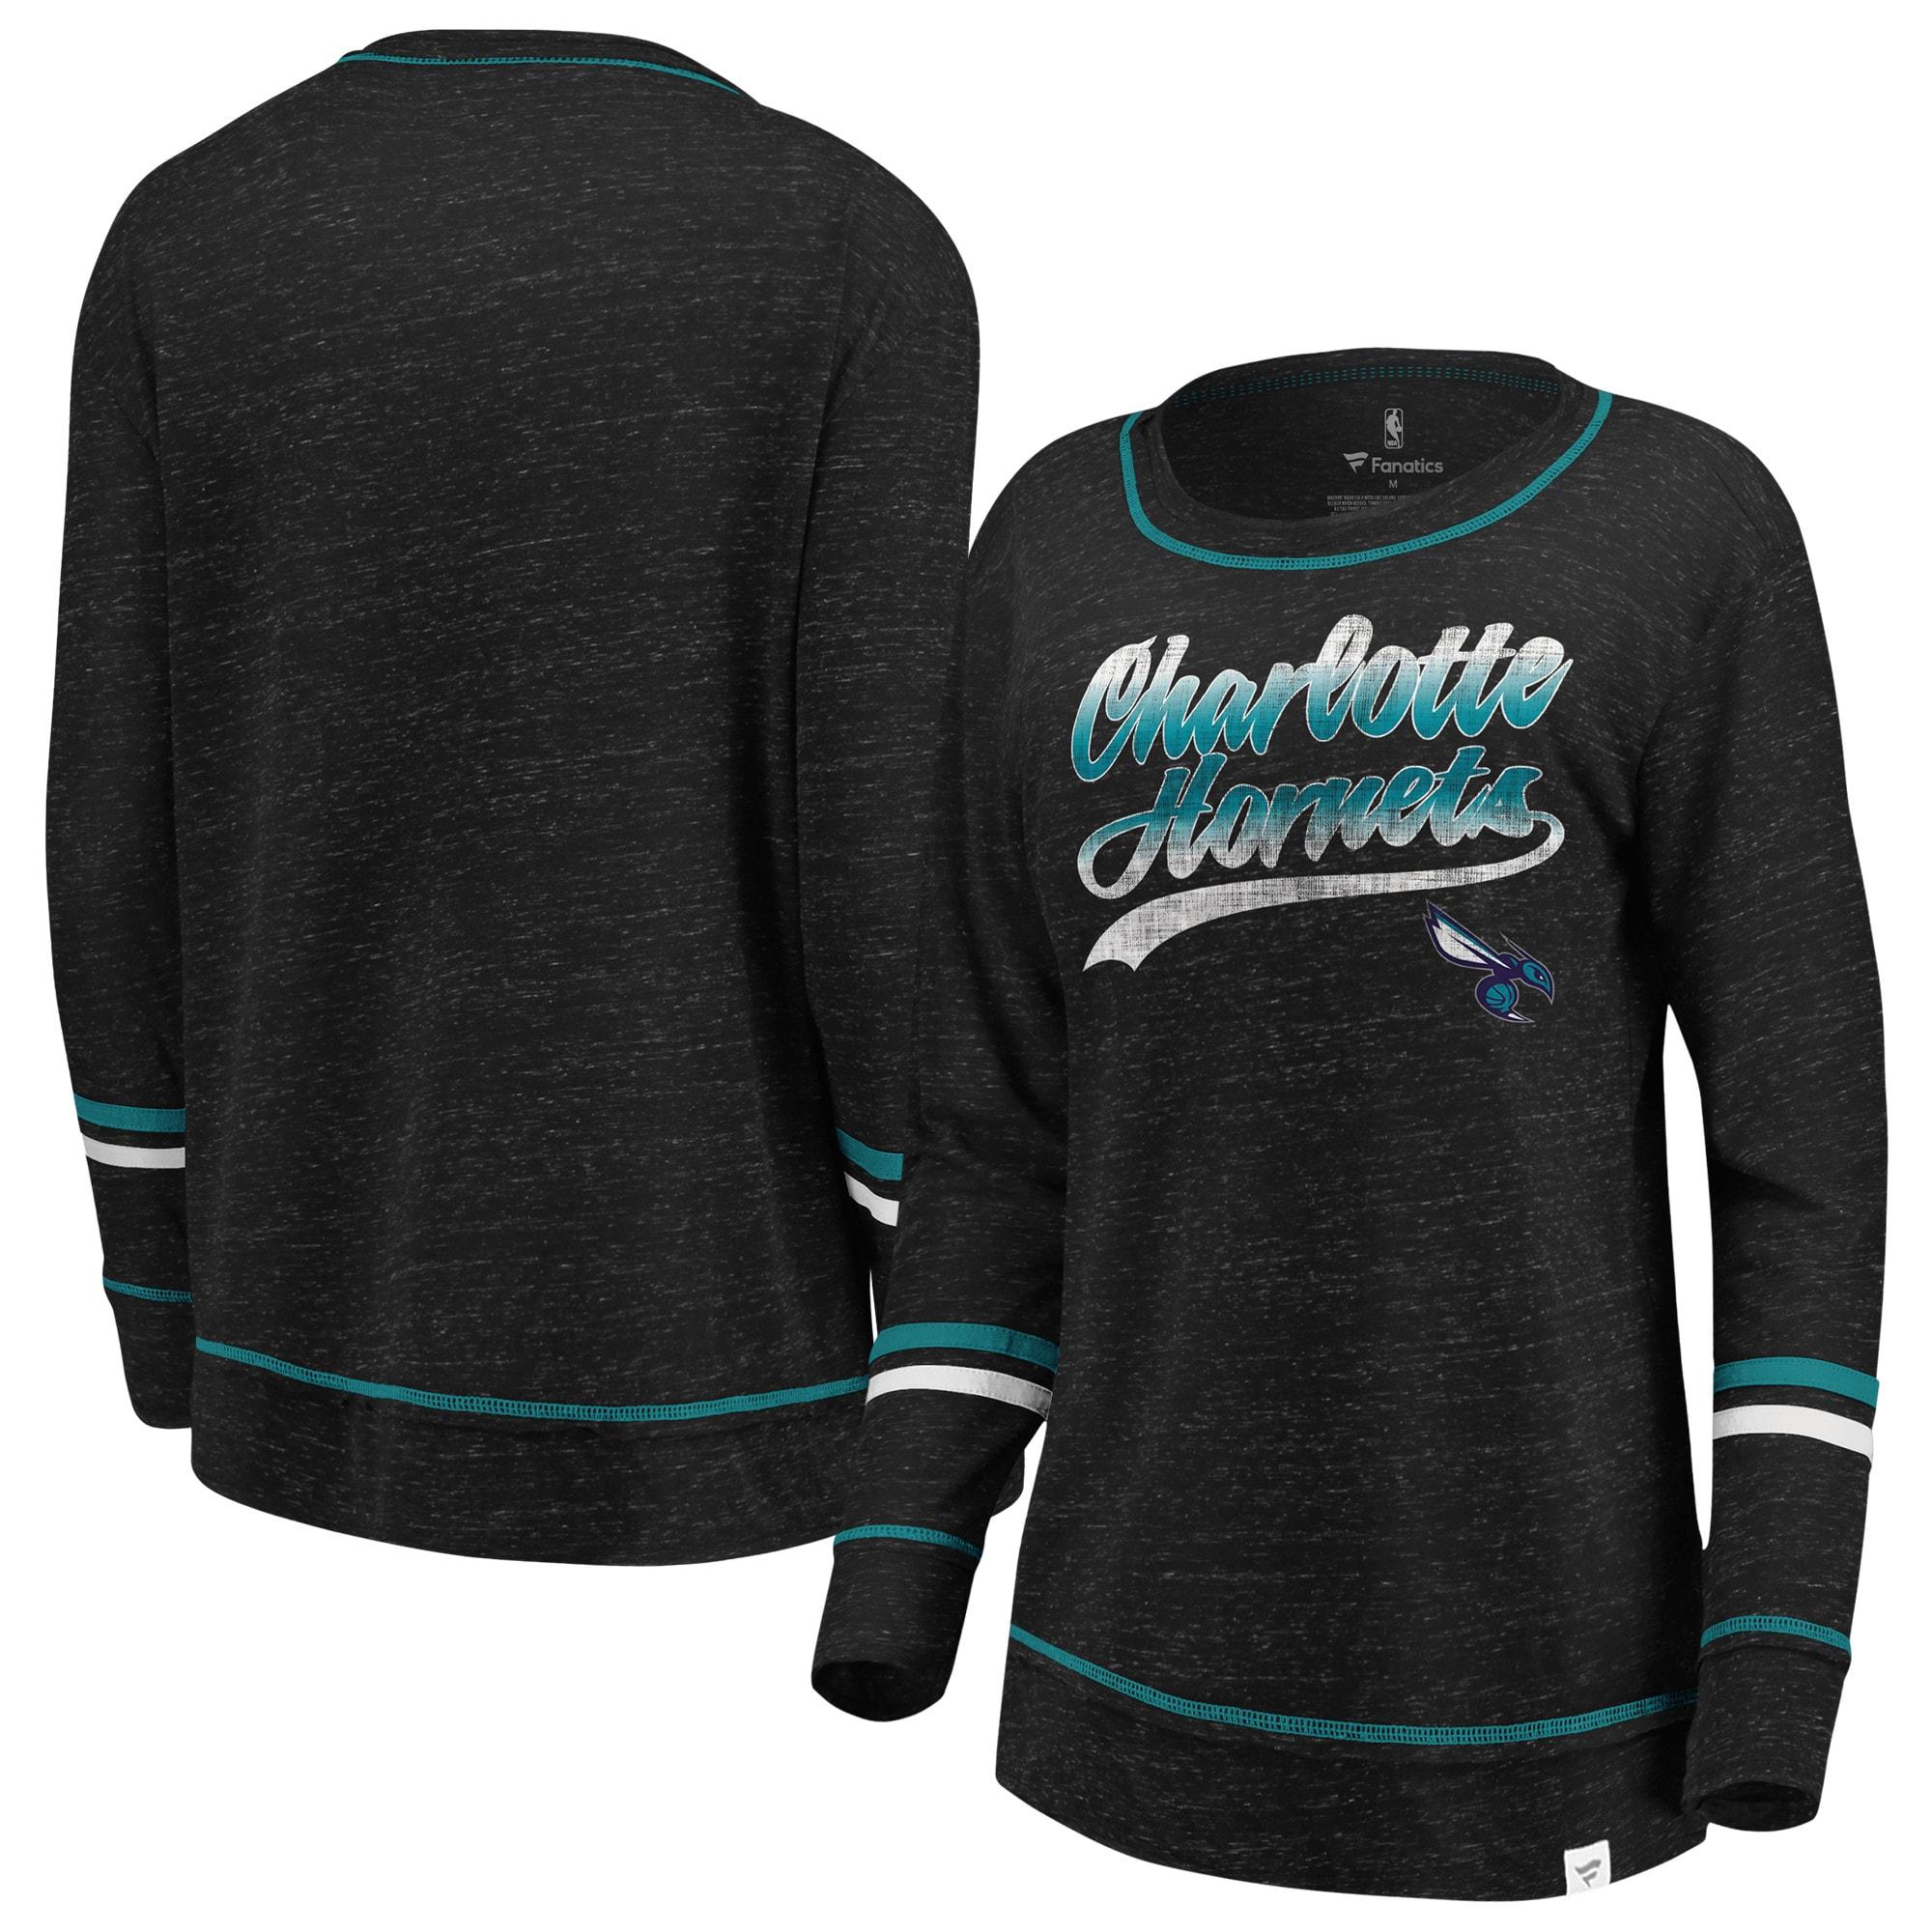 Charlotte Hornets Fanatics Branded Women's Dreams Sleeve Stripe Speckle Long Sleeve T-Shirt - Black/Aqua